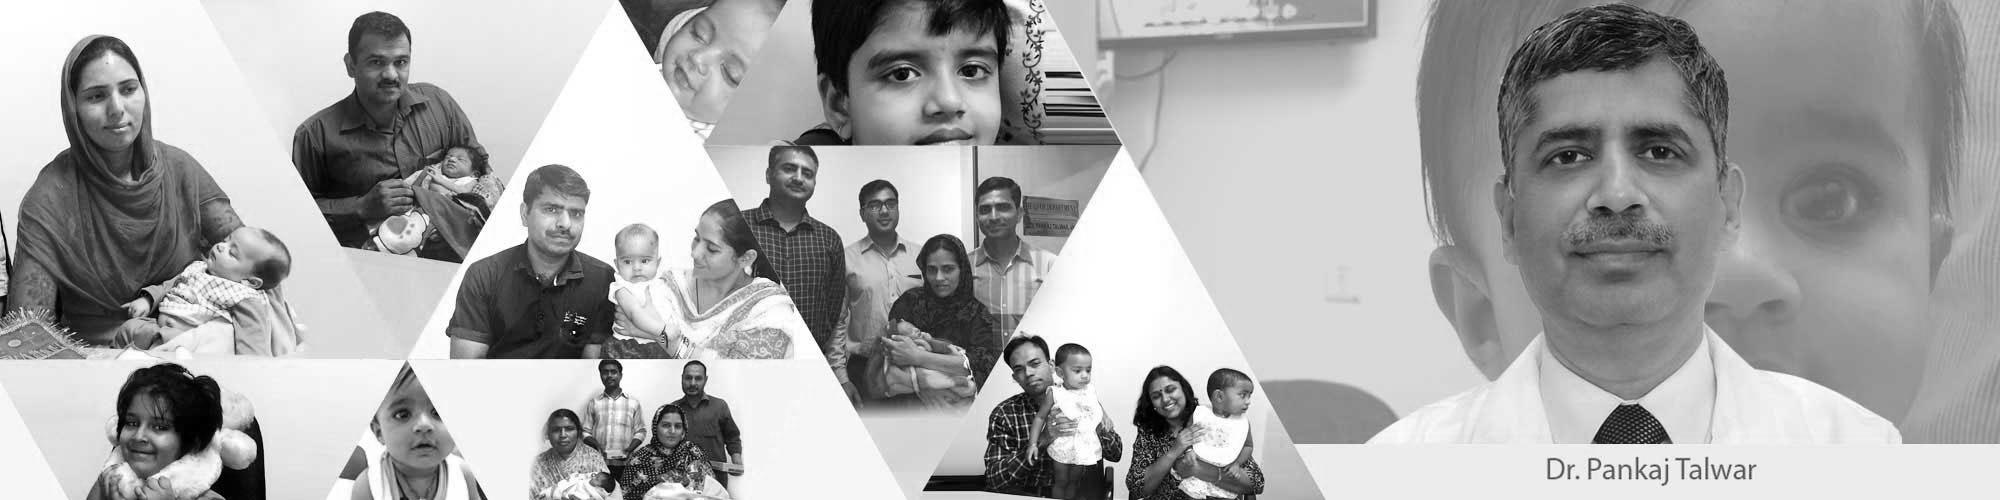 IVF specialist Dr. Pankaj Talwar